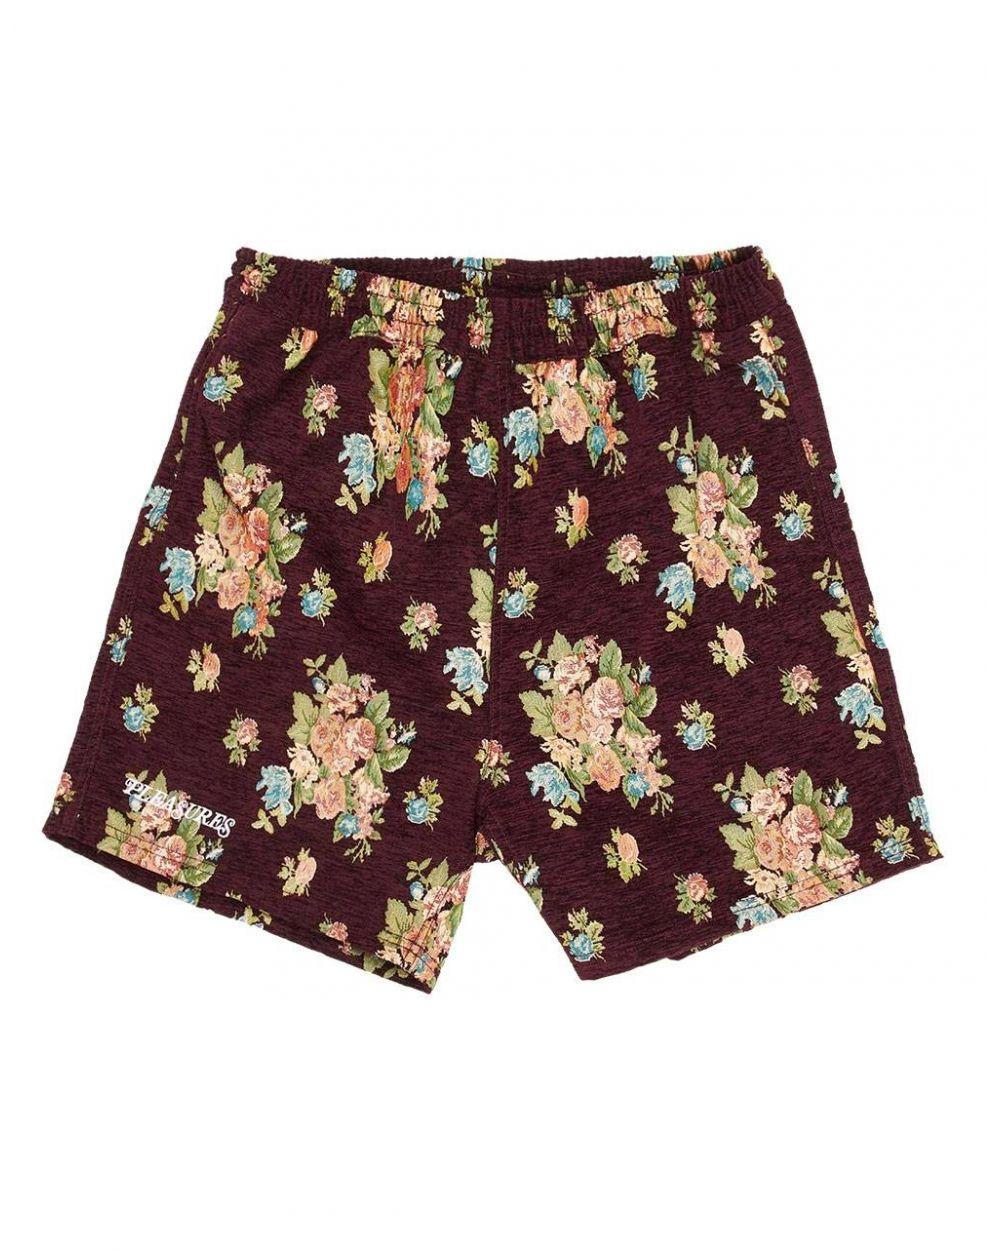 Pleasures Dejavu woven floral shorts - maroon Pleasures Shorts 99,00€